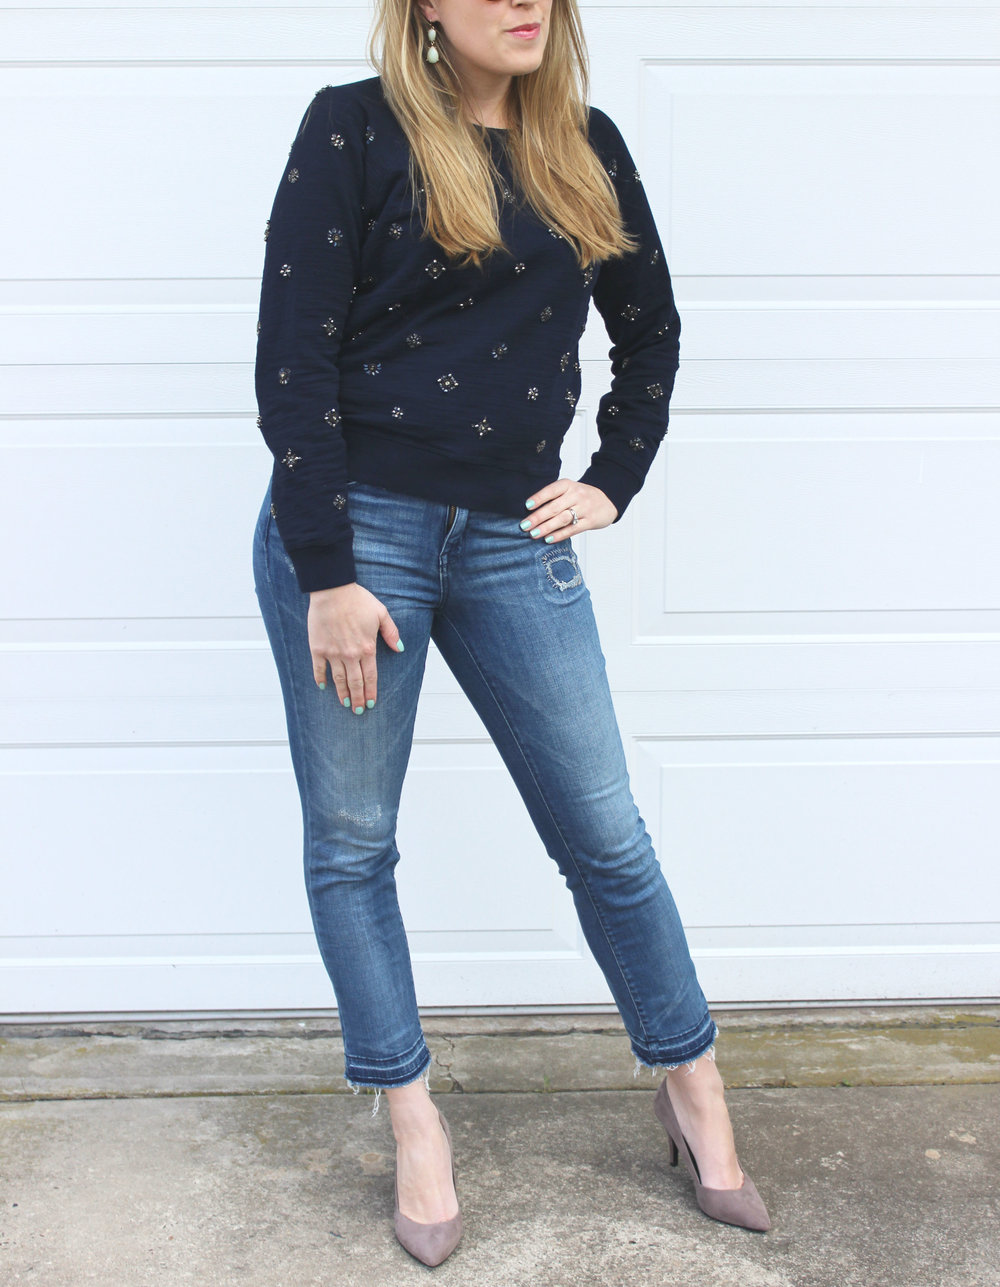 Wearing: The Jeweled Sweatshirt